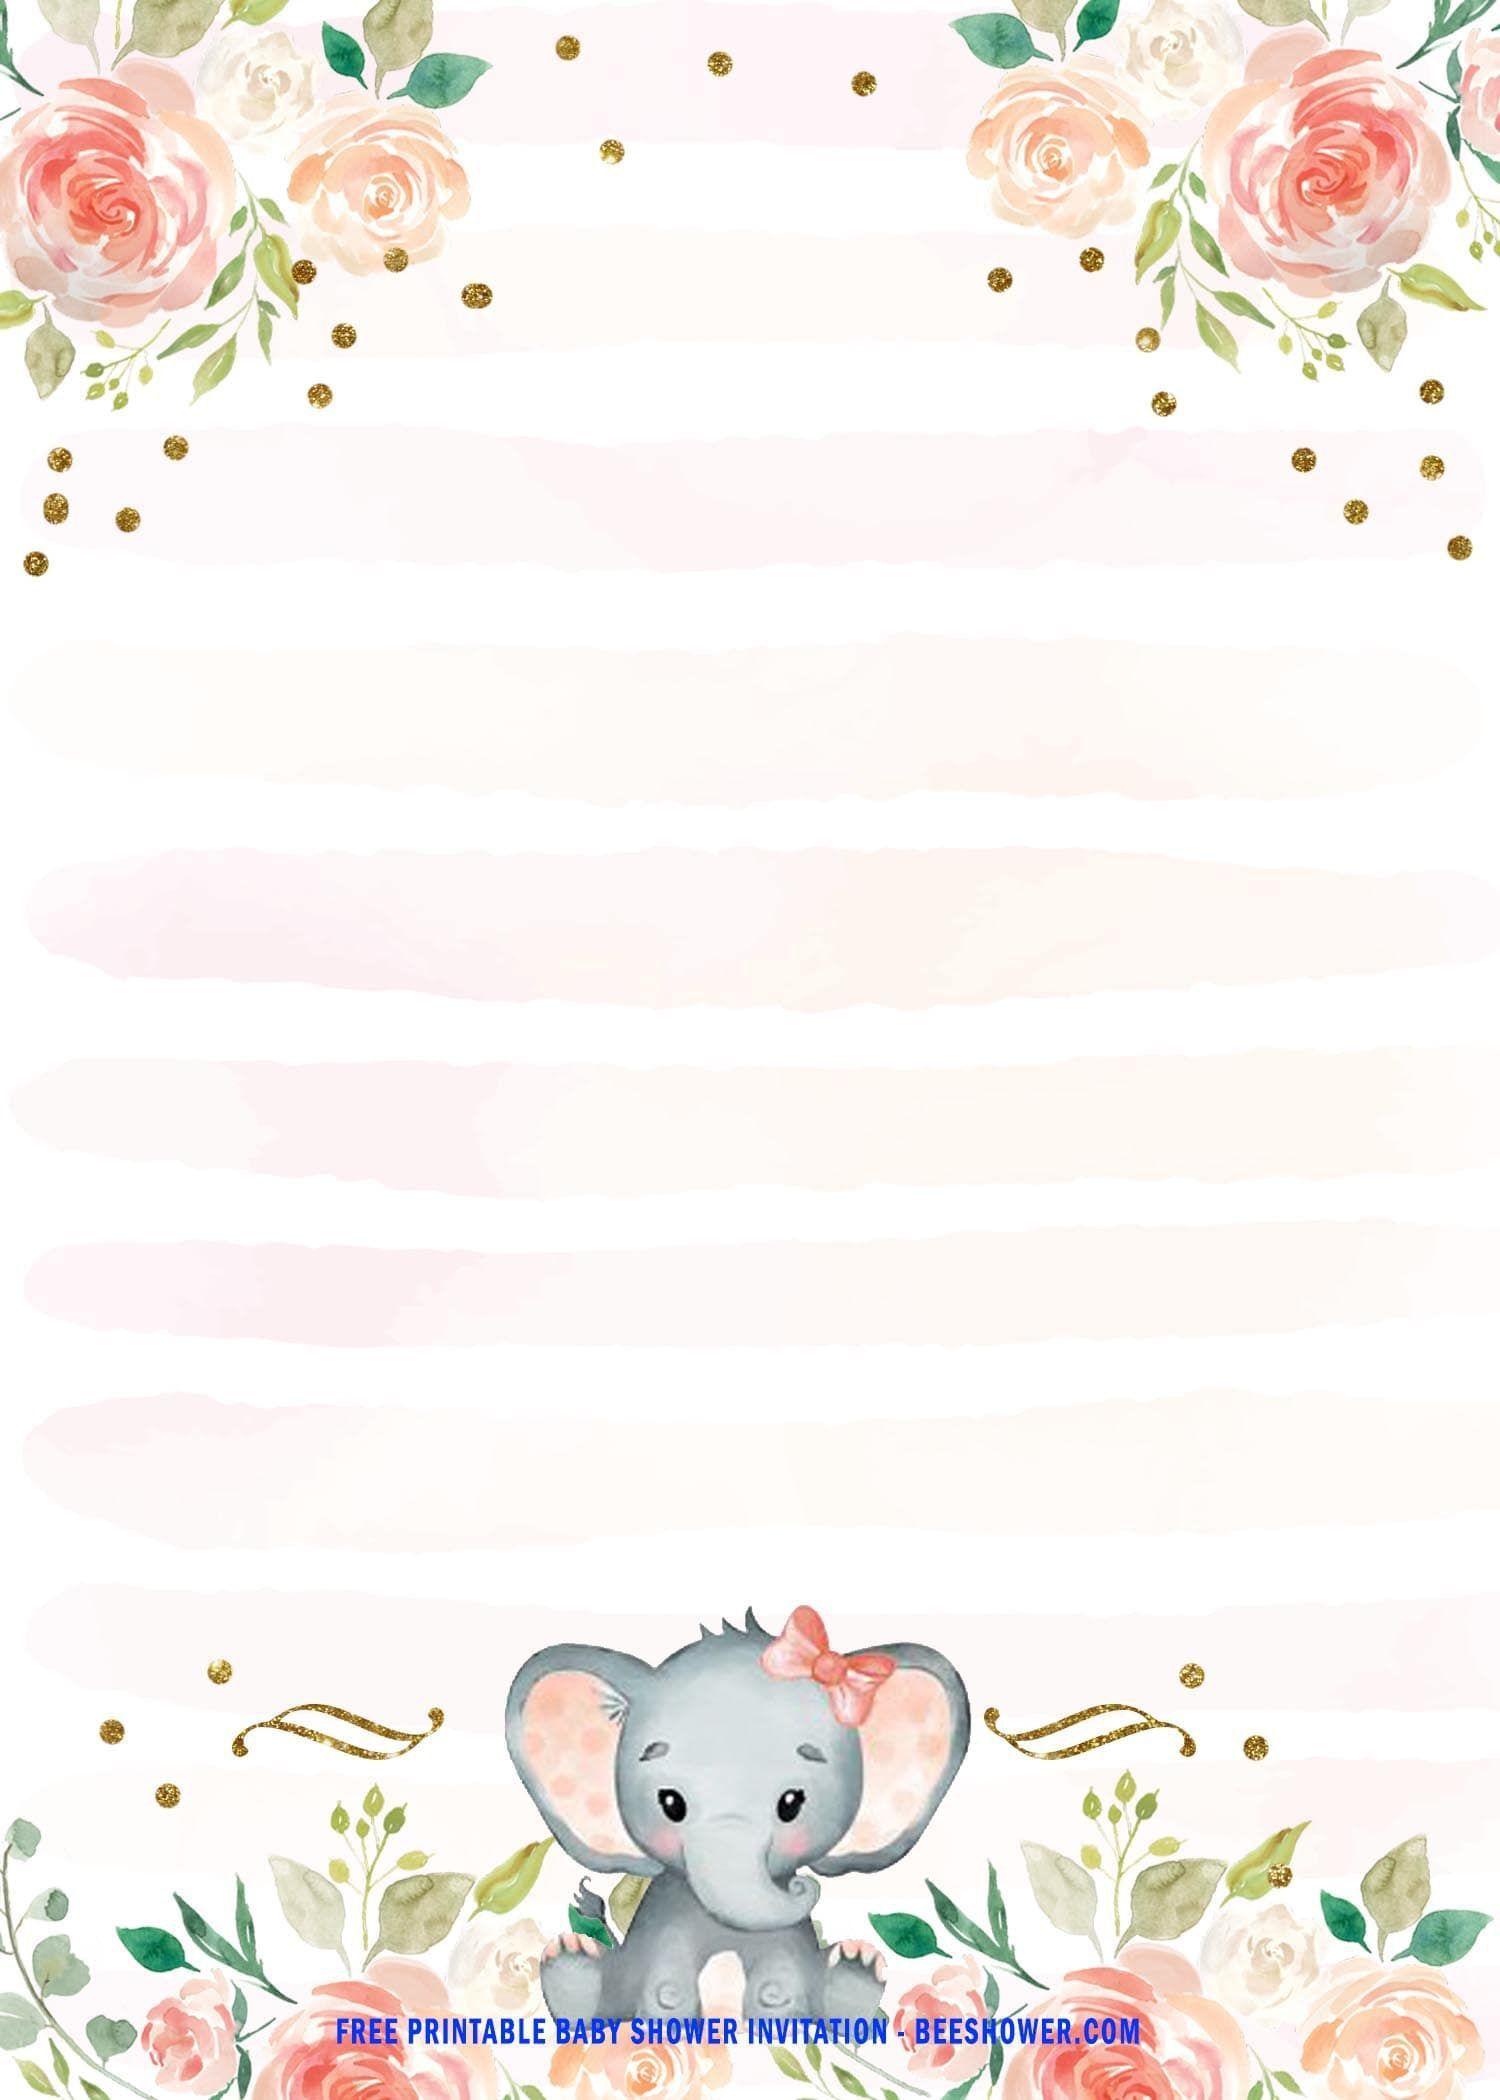 004 Stupendou Free Printable Elephant Baby Shower Invitation Template Example  Templates EditableFull